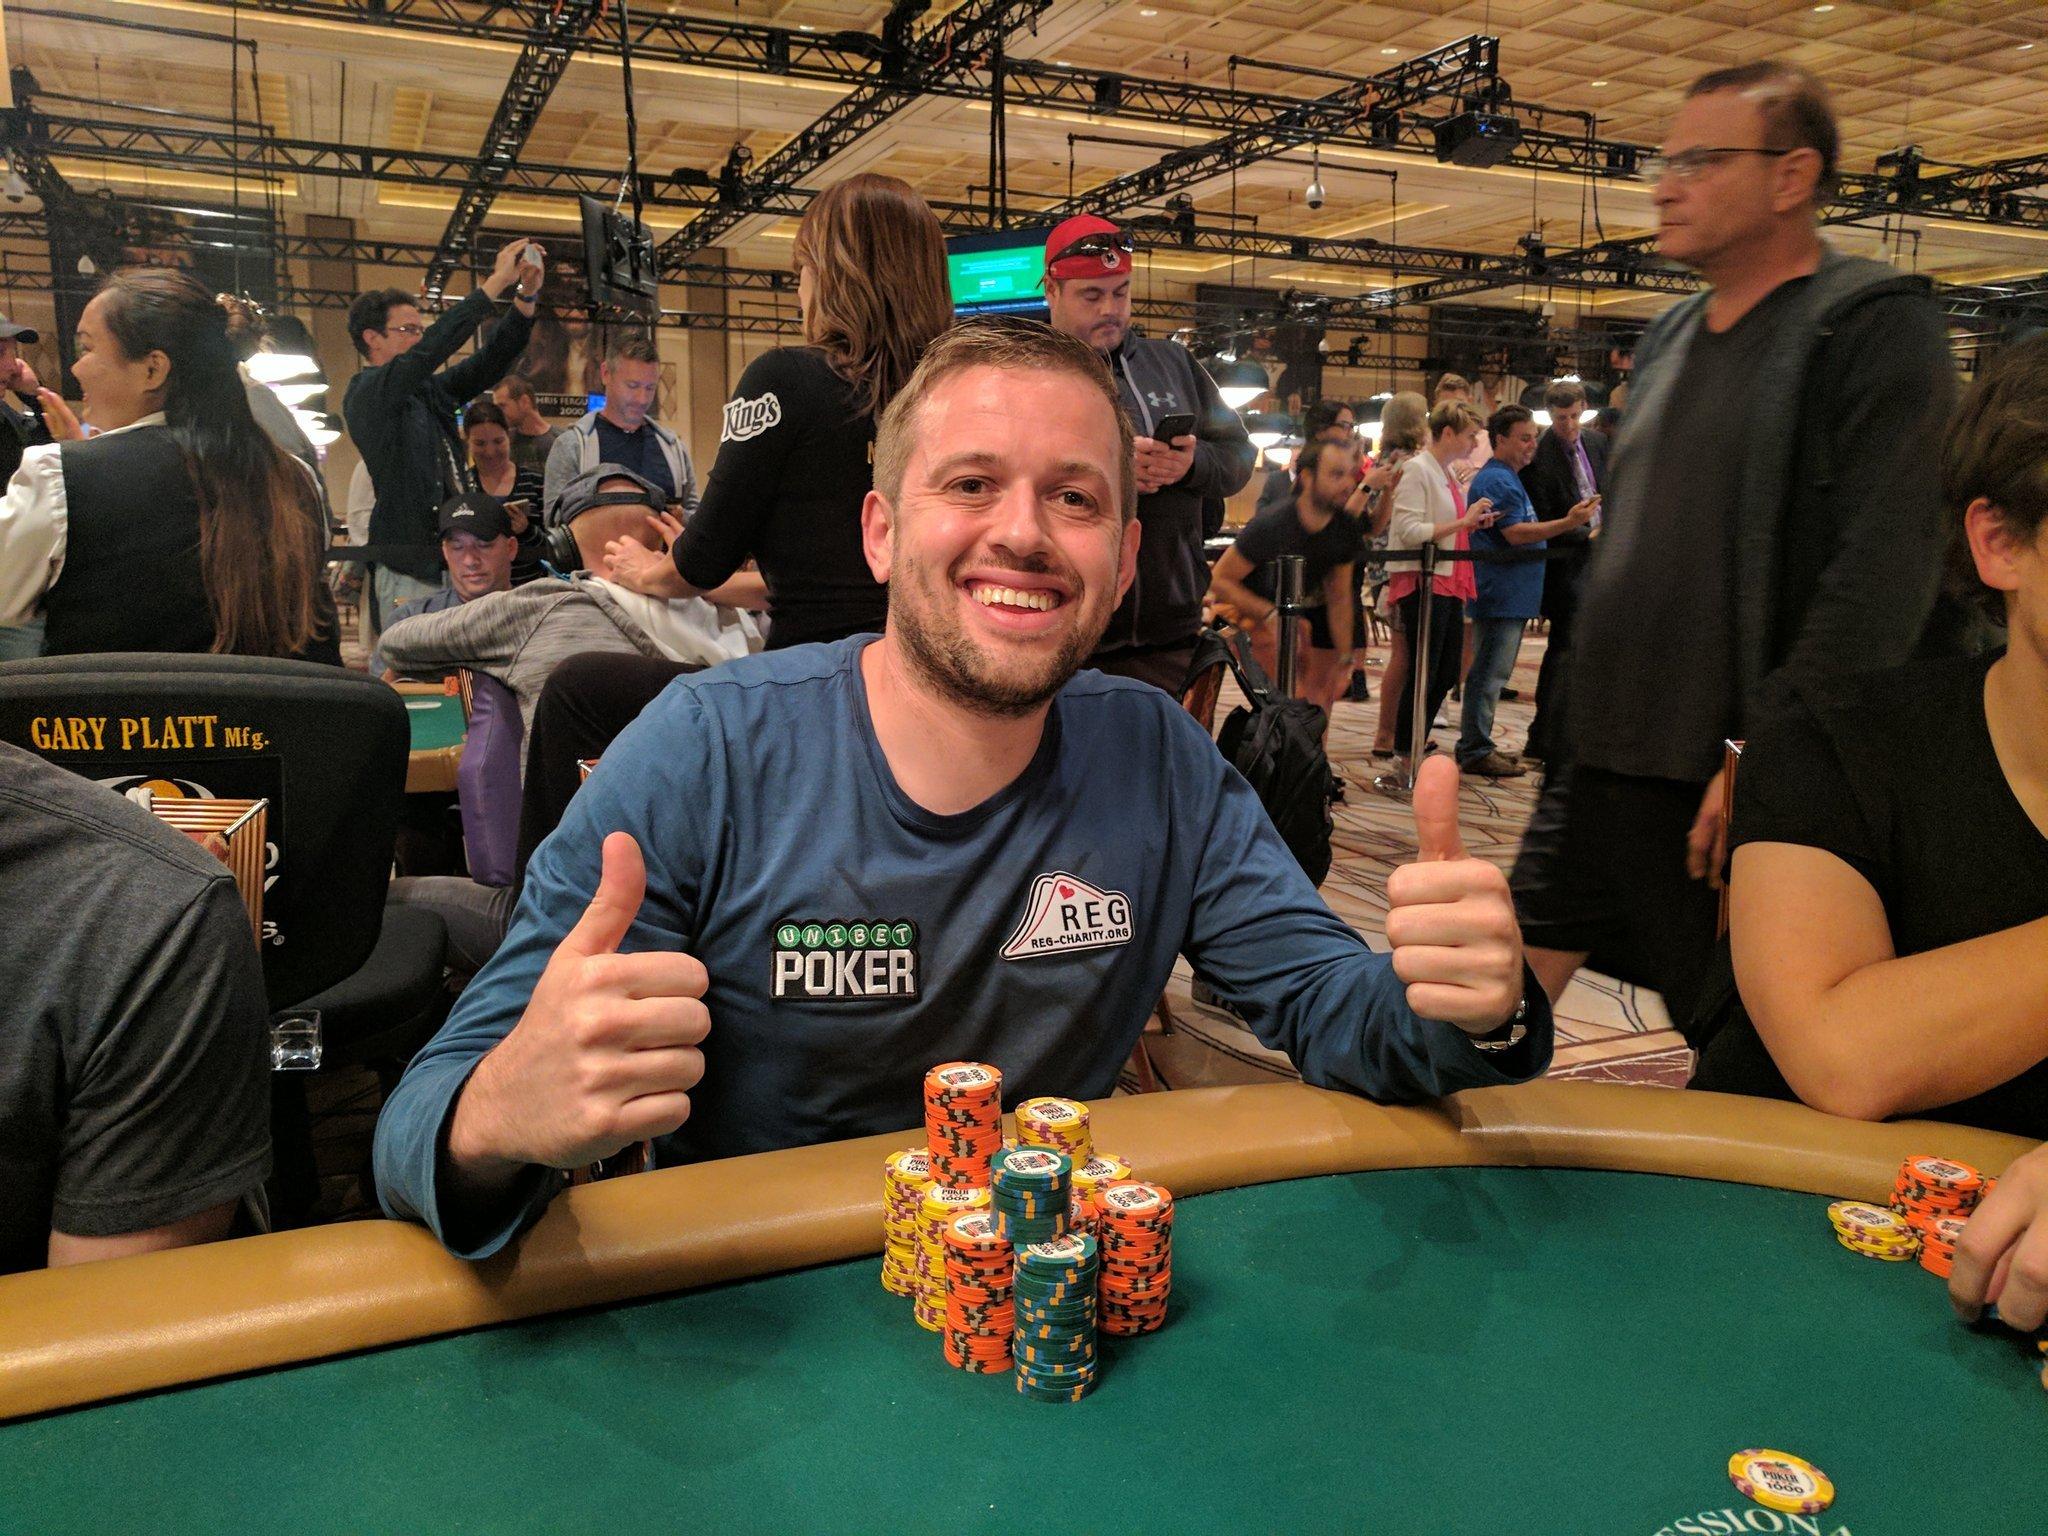 Kenny Hallaert: Interview With An Ambassador Of The Belgium Poker Scene